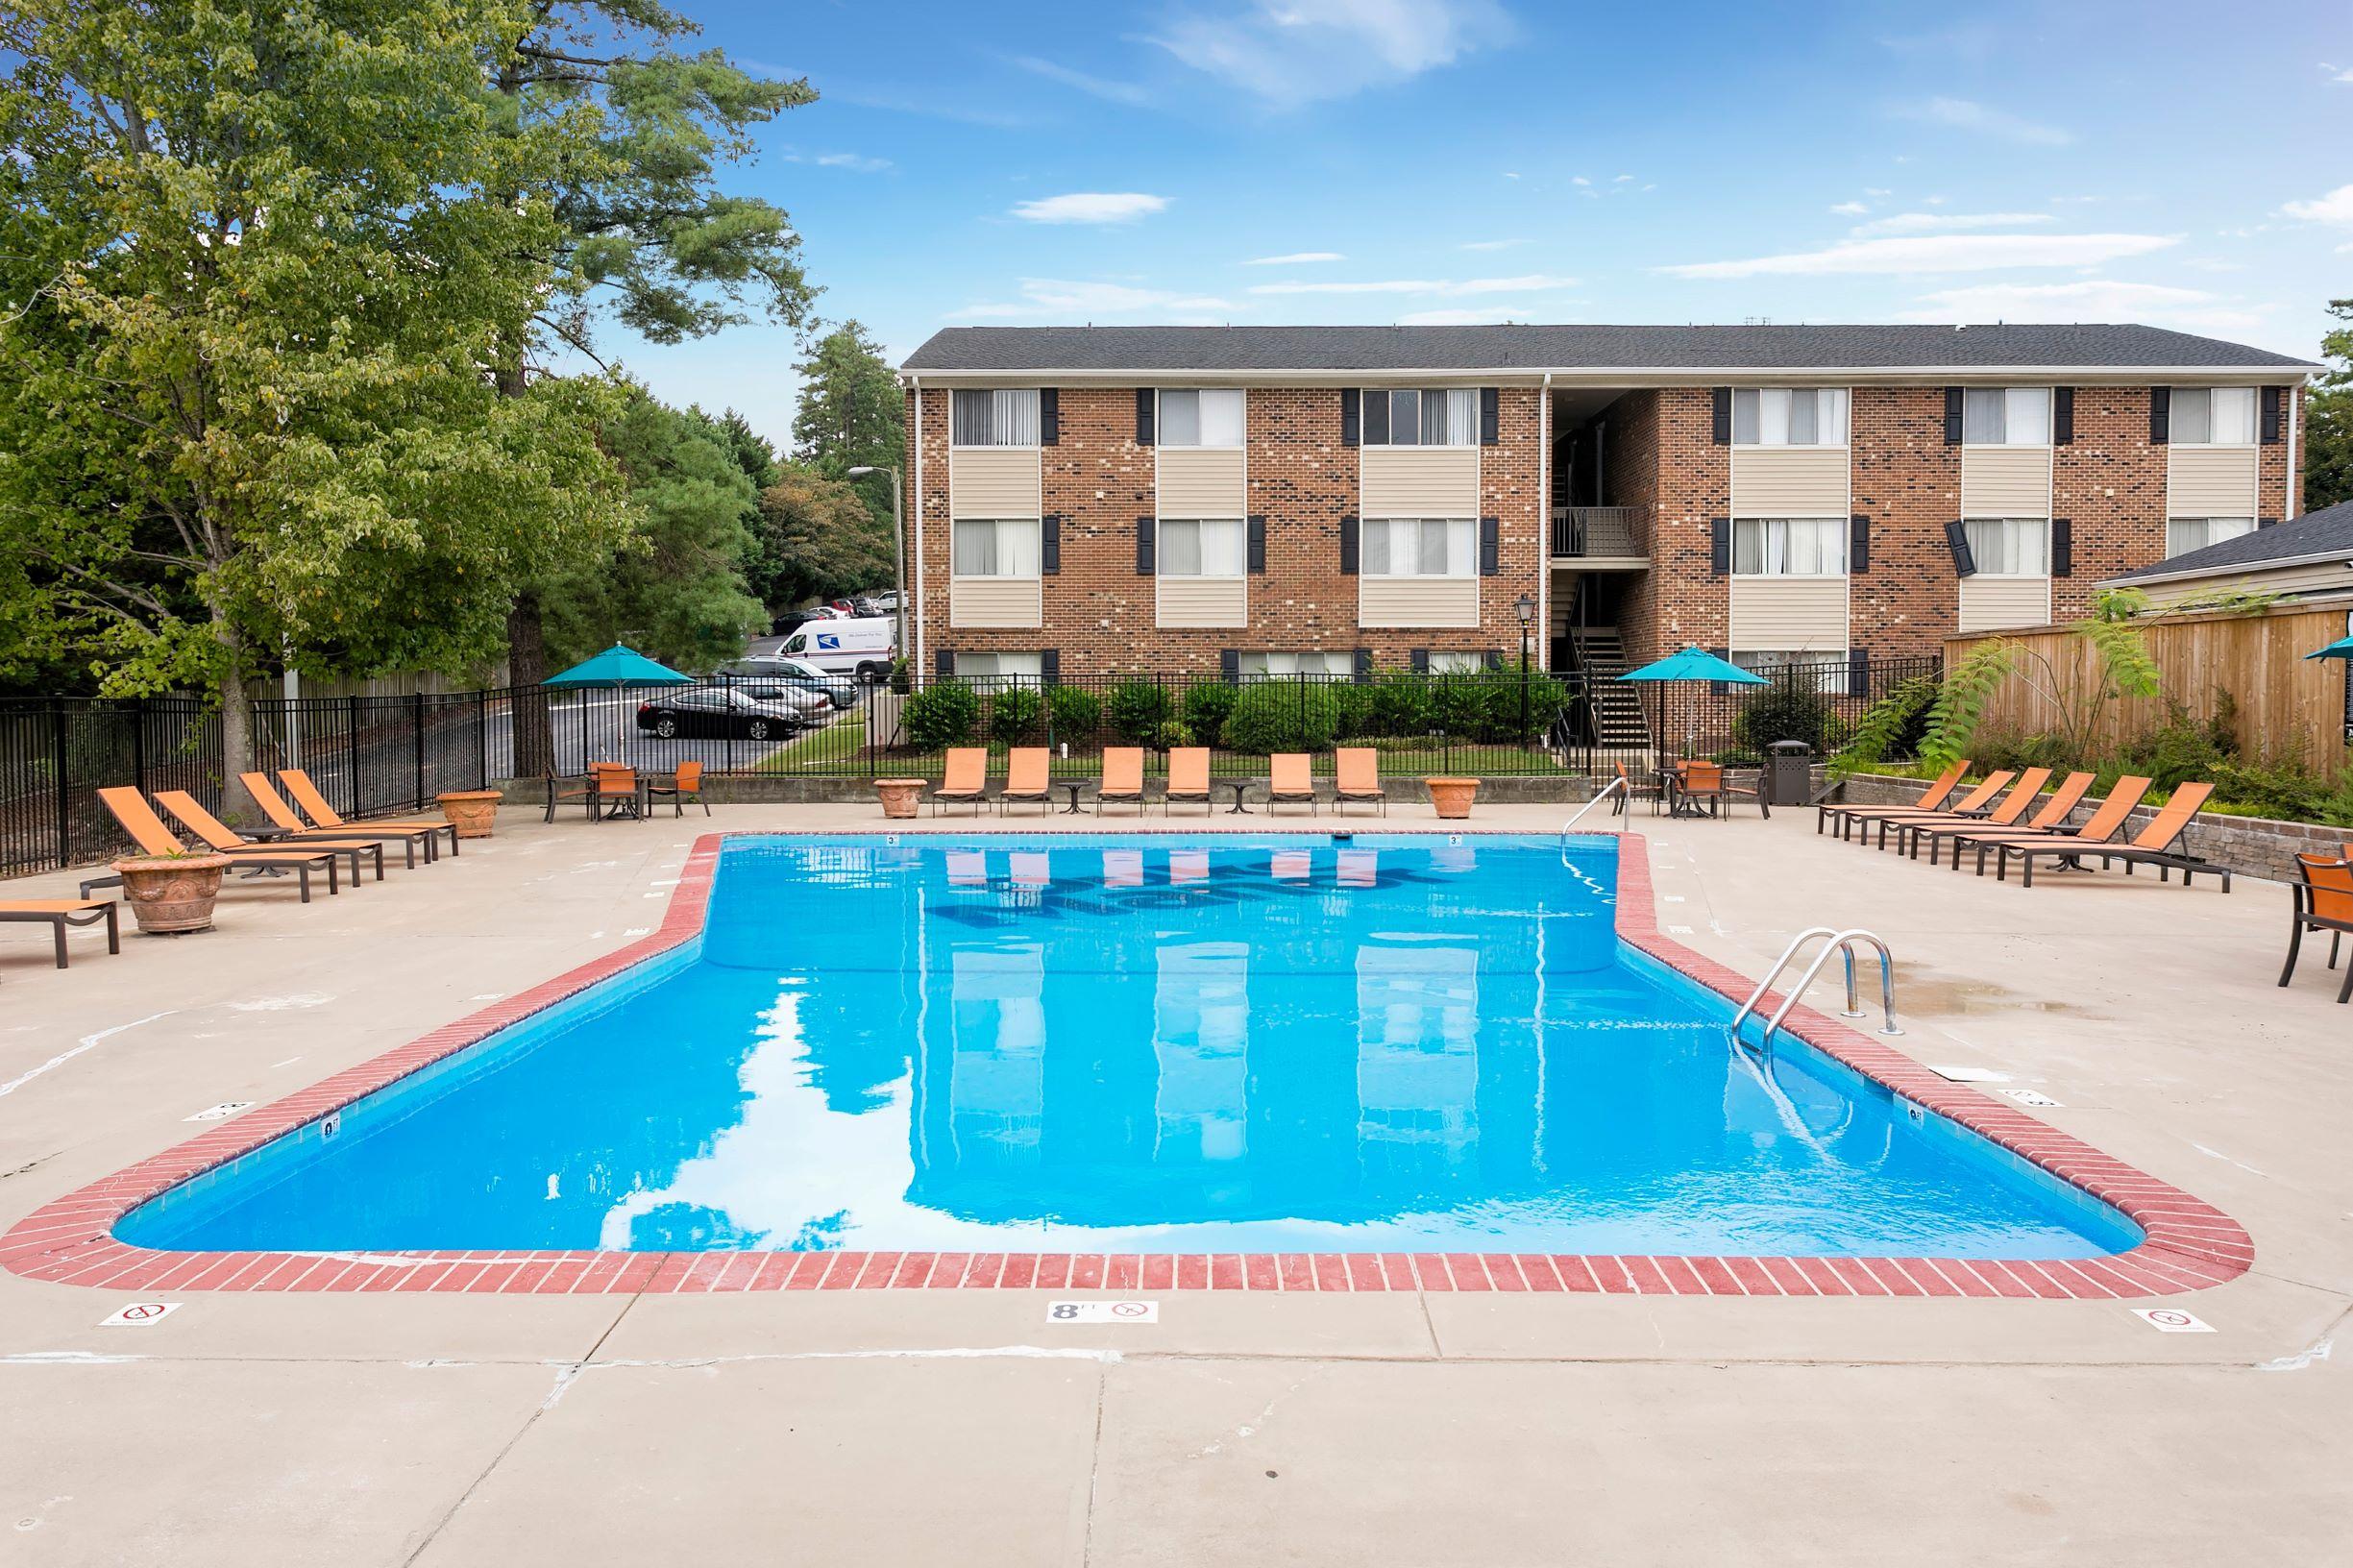 Duke Manor Apartments